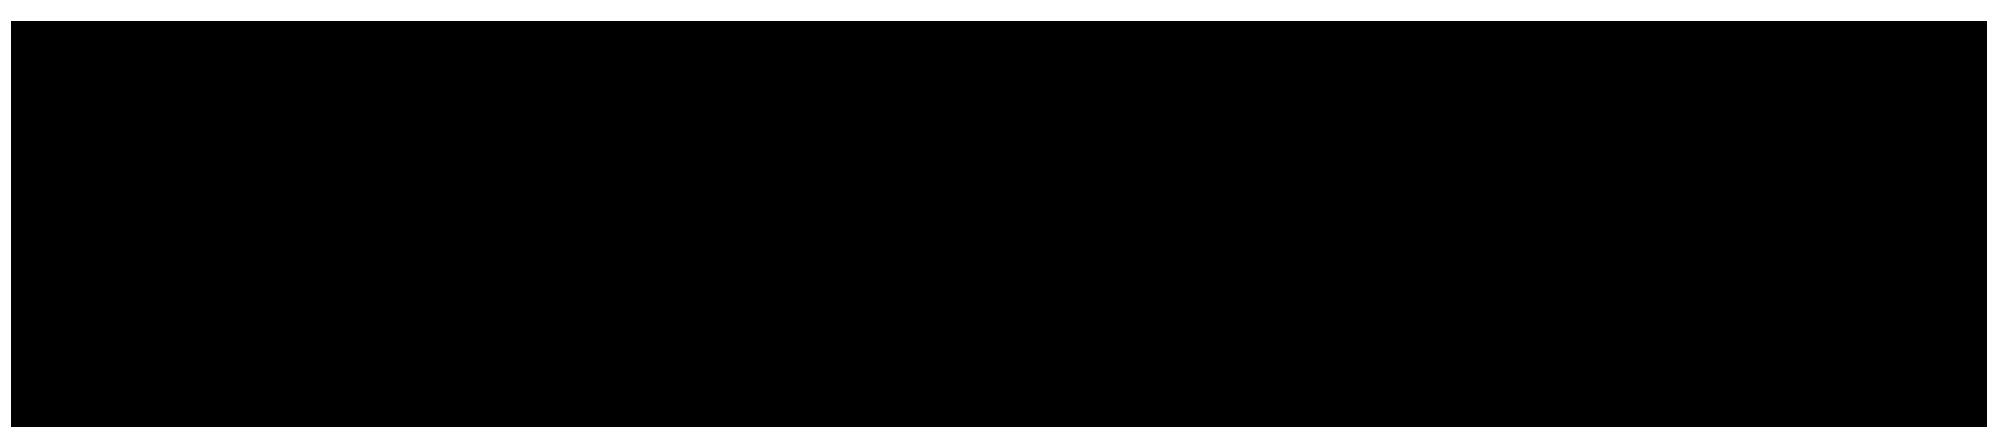 Groundworks Family logos